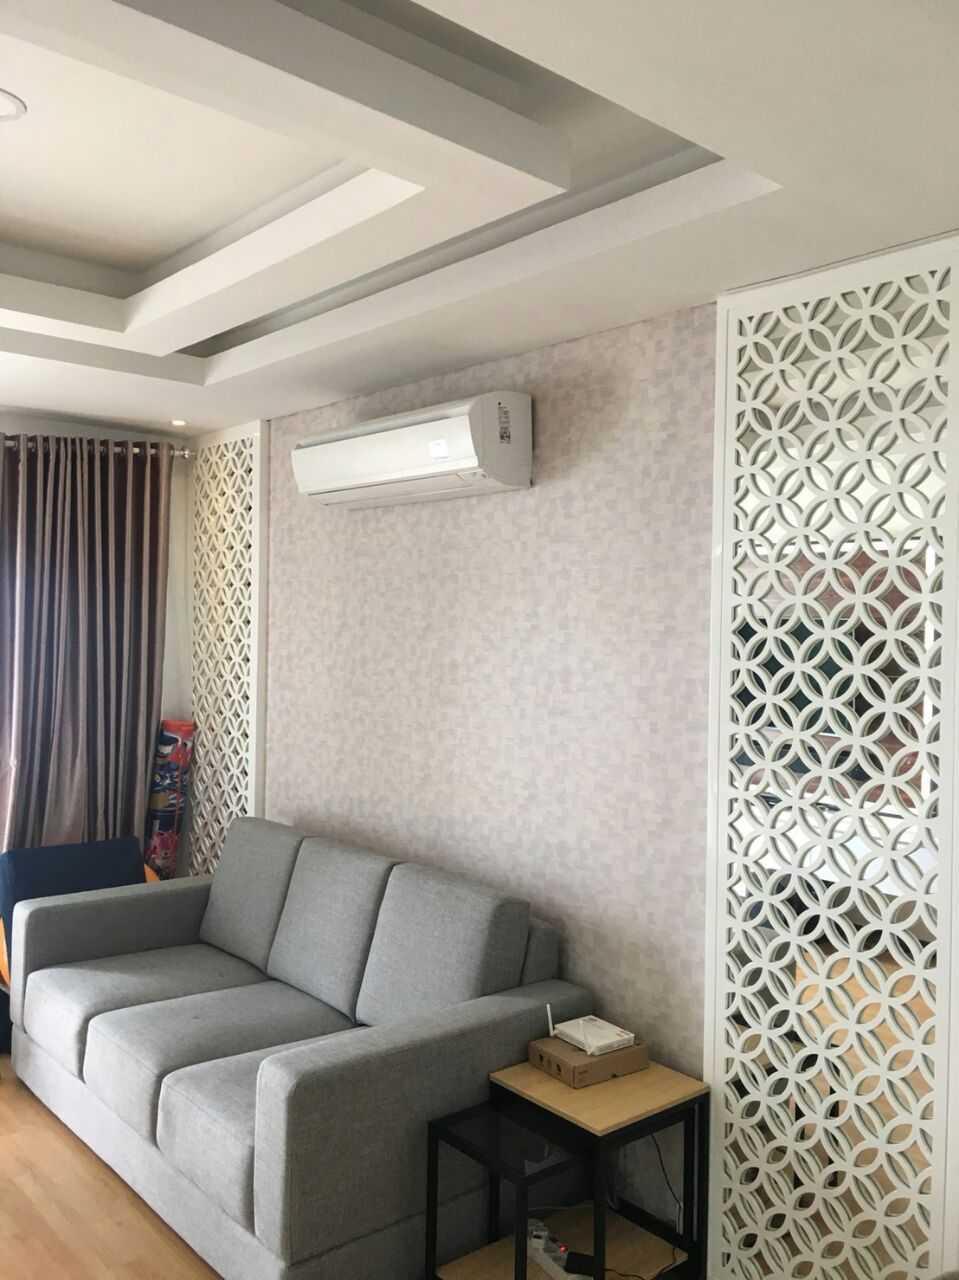 Ceka Arsitektur Interior Greenbay Condominium 20, Jl. Pluit Karang Ayu Barat No.b1, Rw.2, Pluit, Kec. Penjaringan, Kota Jkt Utara, Daerah Khusus Ibukota Jakarta 14450, Indonesia 20, Jl. Pluit Karang Ayu Barat No.b1, Rw.2, Pluit, Kec. Penjaringan, Kota Jkt Utara, Daerah Khusus Ibukota Jakarta 14450, Indonesia Ceka-Arsitektur-Interior-Greenbay-Condominium  86728